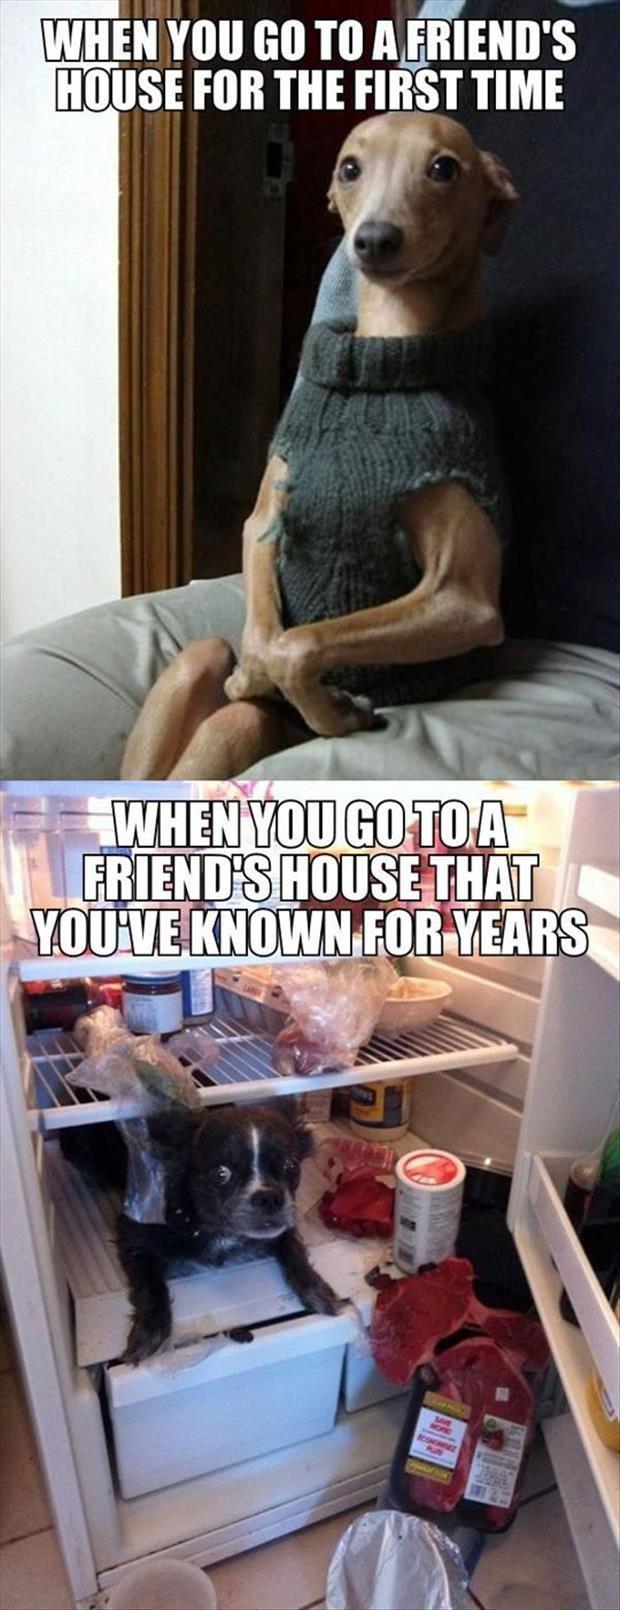 Friend's house feelings #funny #dogs #memes -  Friend's house feelings #funny #dogs #memes Friend's house feelings #funny #dogs #memes Friend� - #Dogs #feelings #friend #friends #funny #house #memes #Pets #Petsaccessories #Petsdiy #Petsdogs #Petsdogsaccessories #Petsdogsbreeds #Petsdogspuppies #Petsfish #Petsfunny #Petsideas #Petsquotes #Petsunique #smallPets #smallPetsforkids